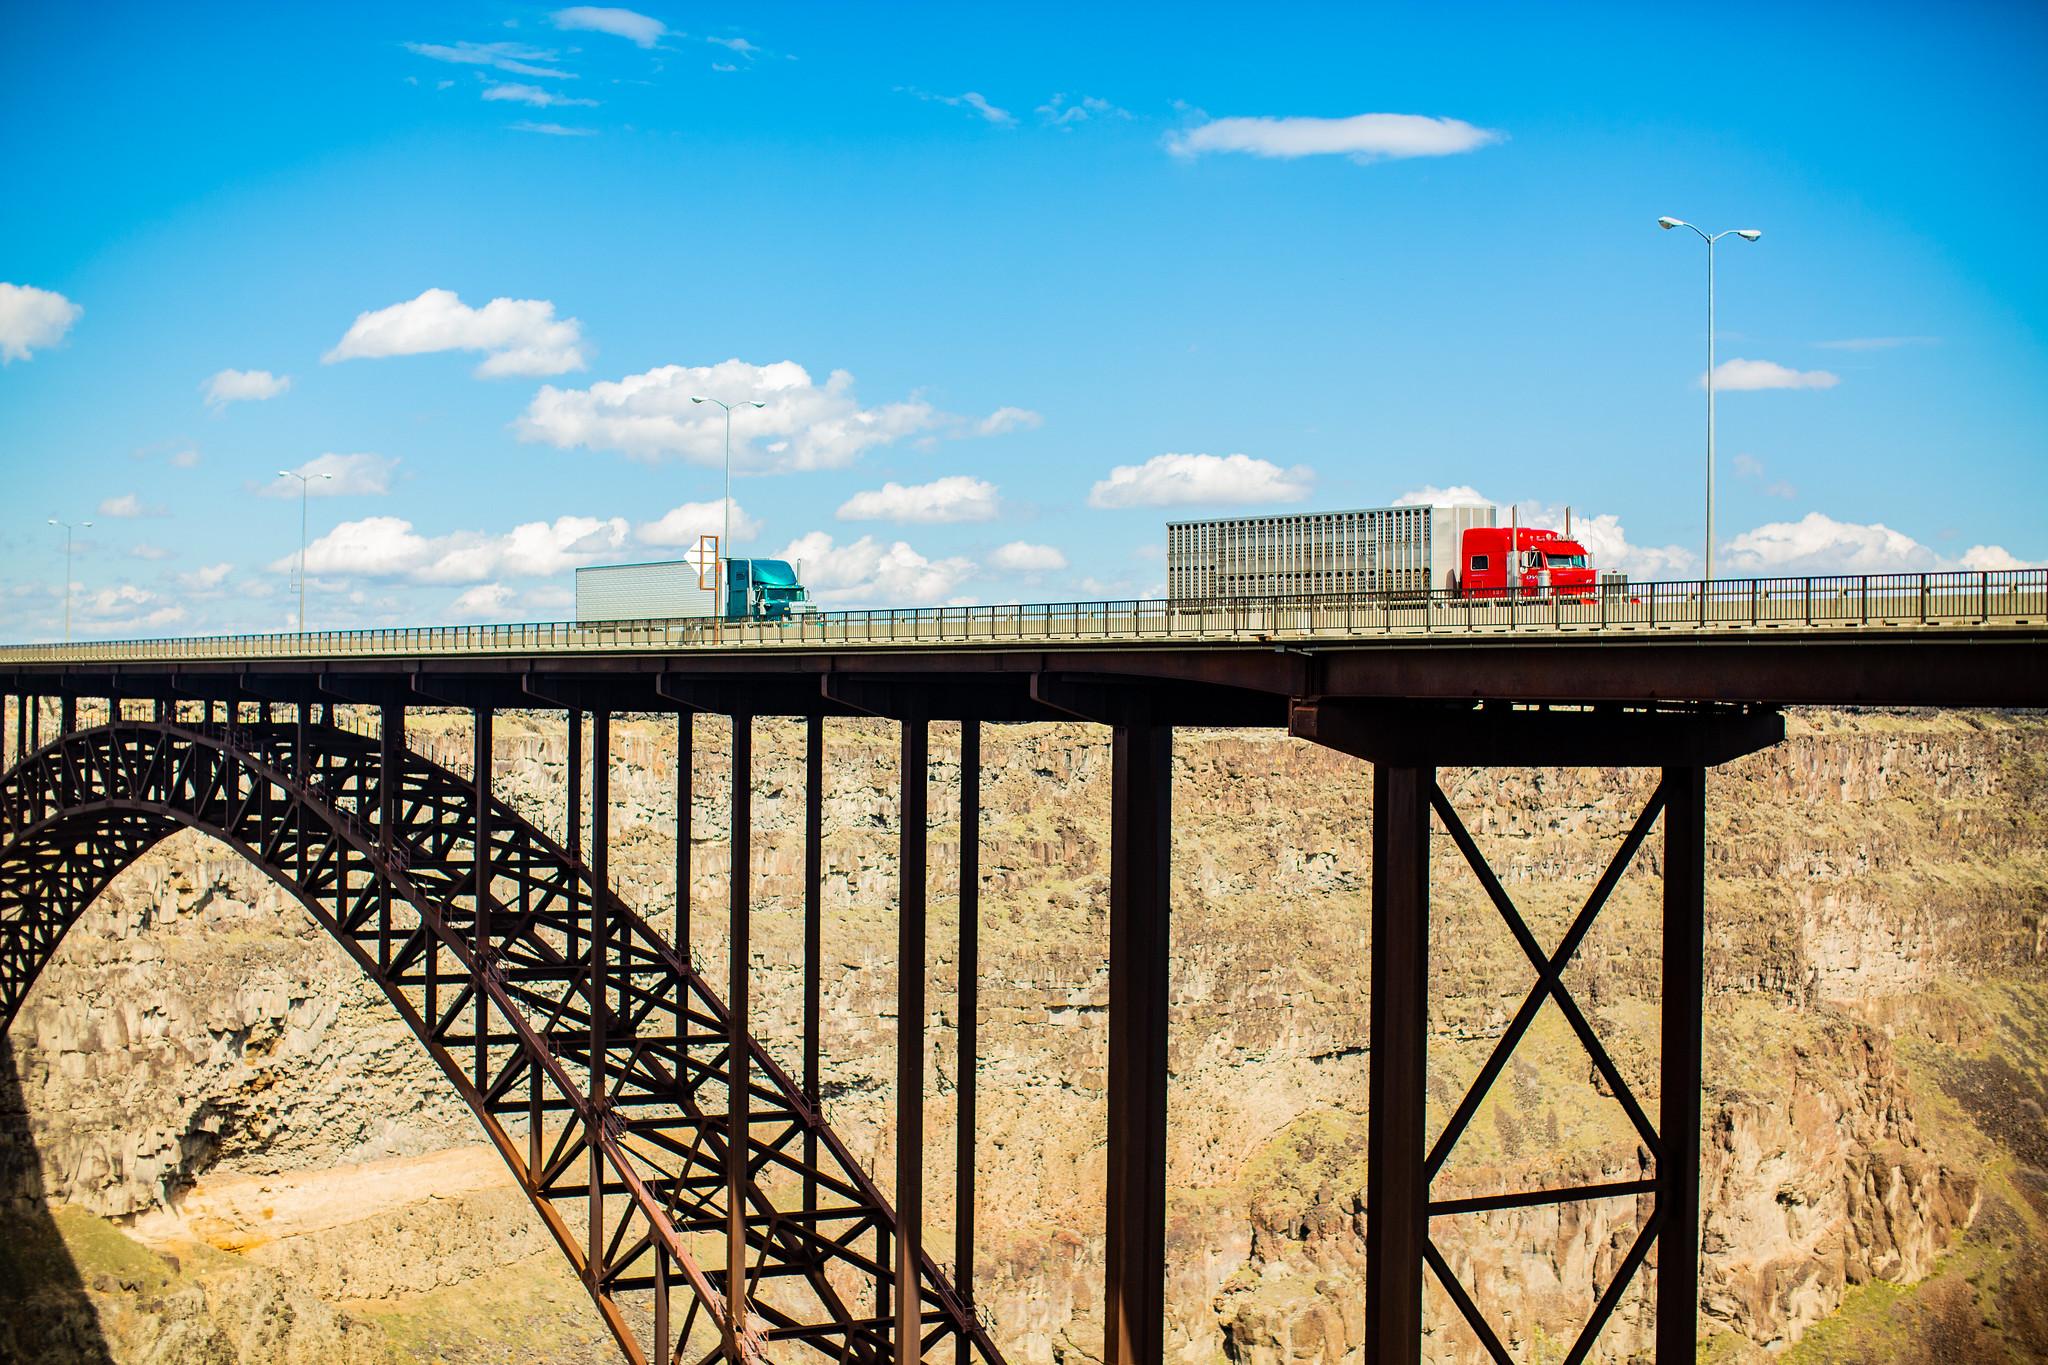 Photo of two trucks on a bridge.